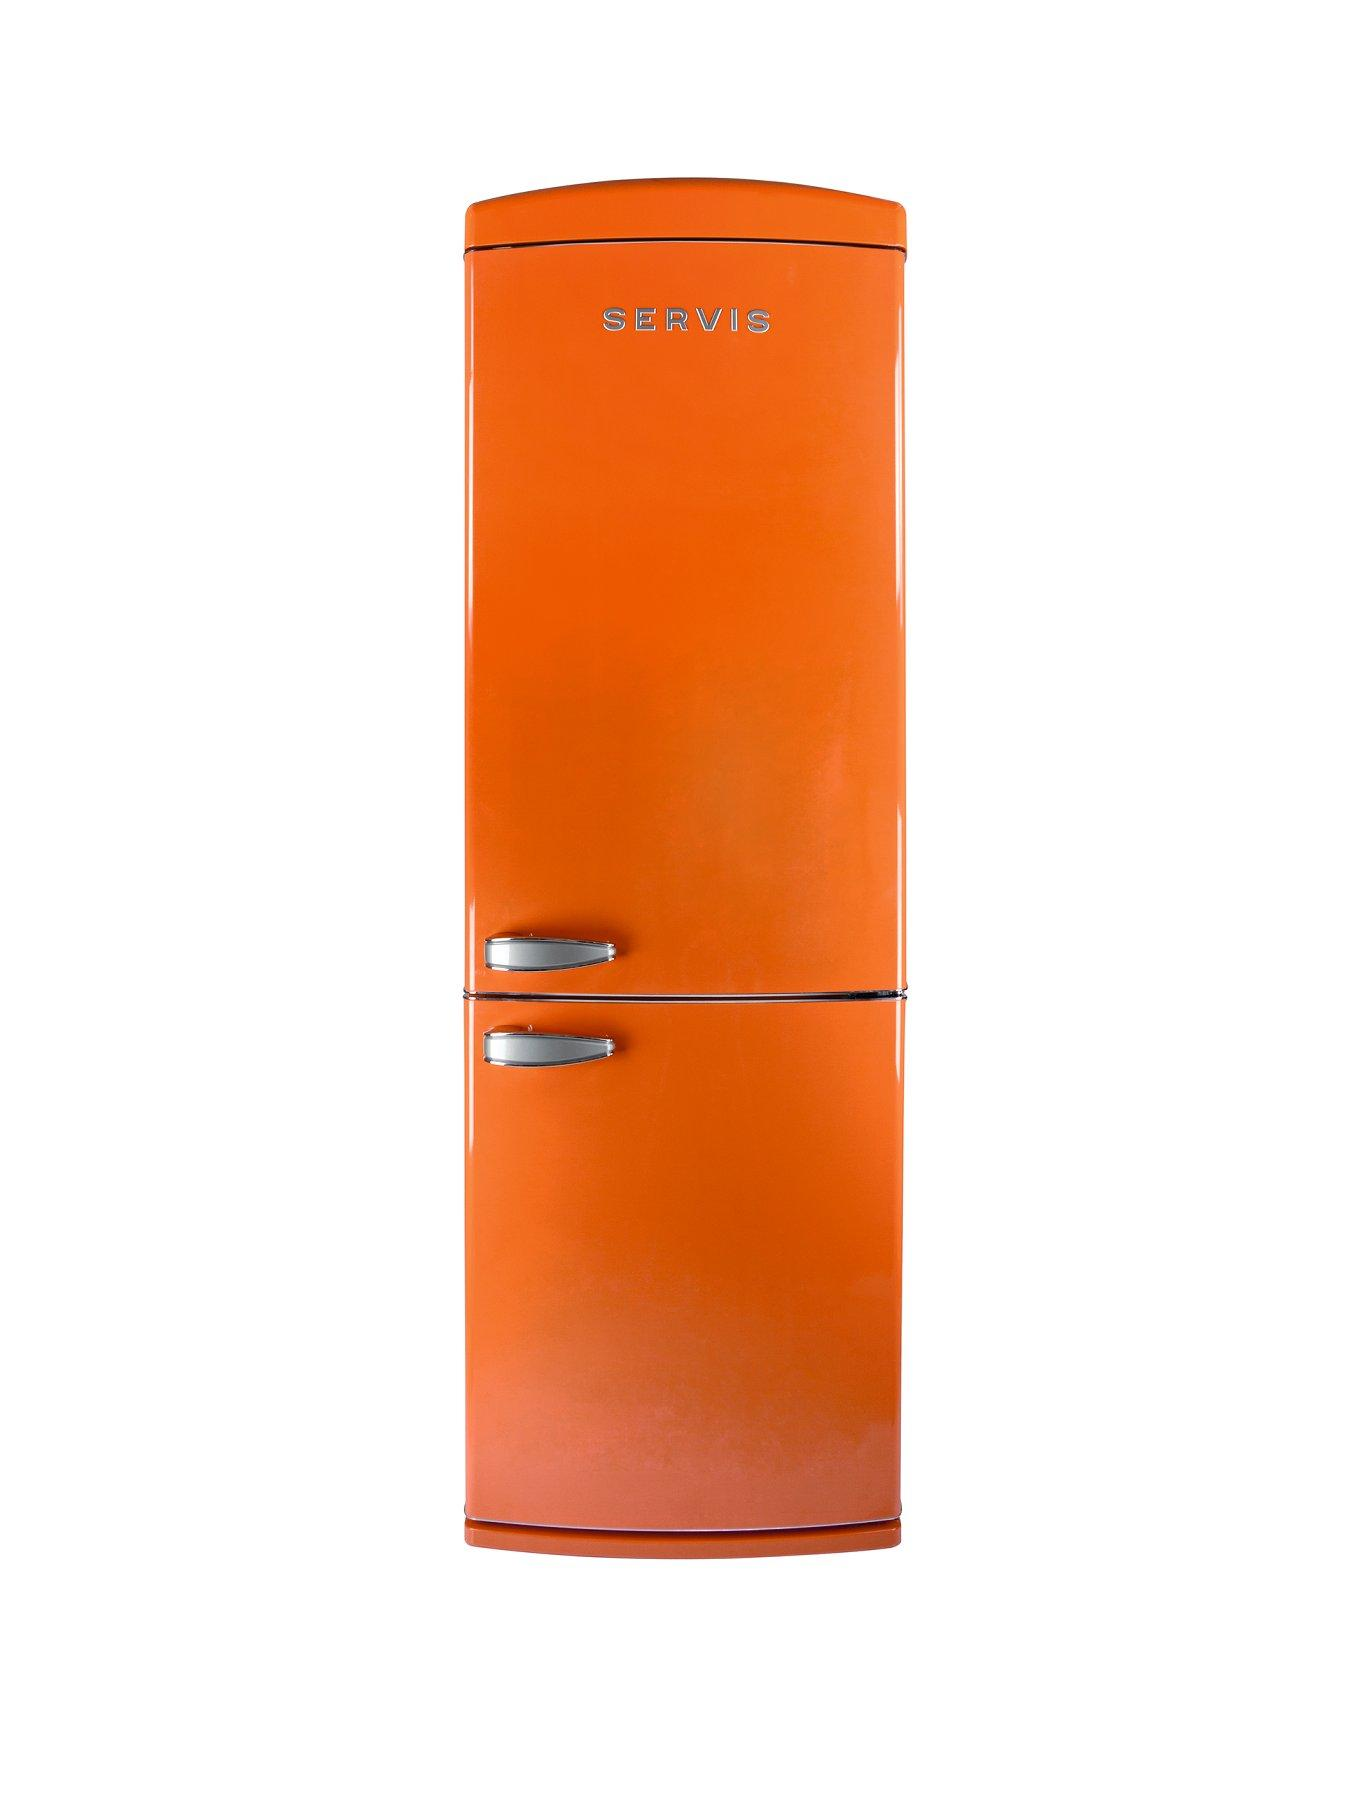 C60185NFTG 60cm No Frost Fridge Freezer  Orange